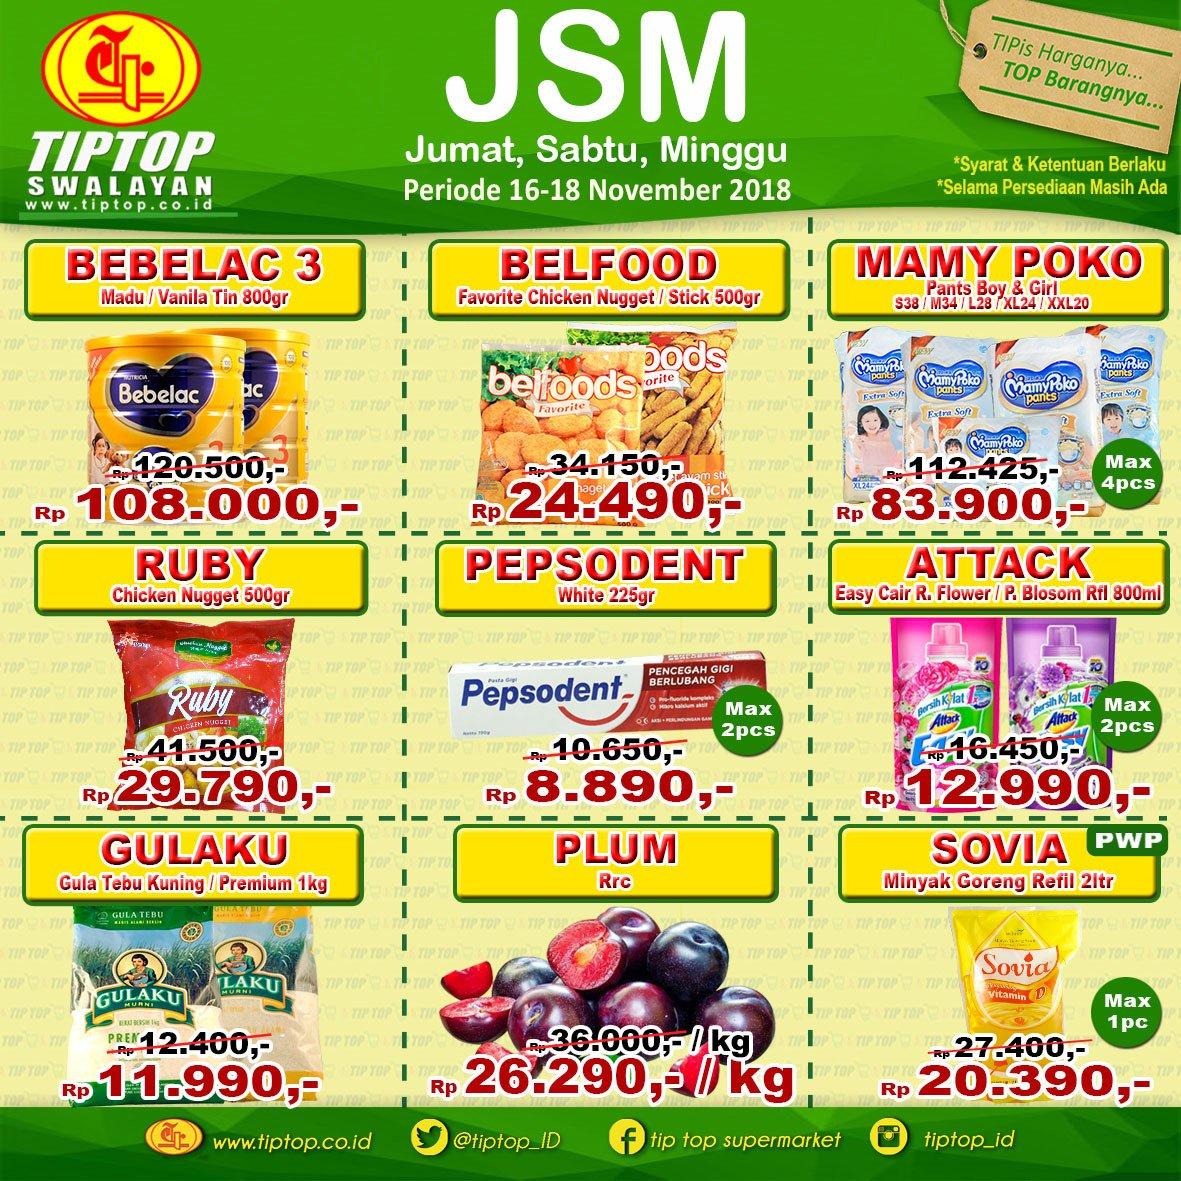 TipTop - Promo Katalog JSM Periode 16 - 18 November 2018